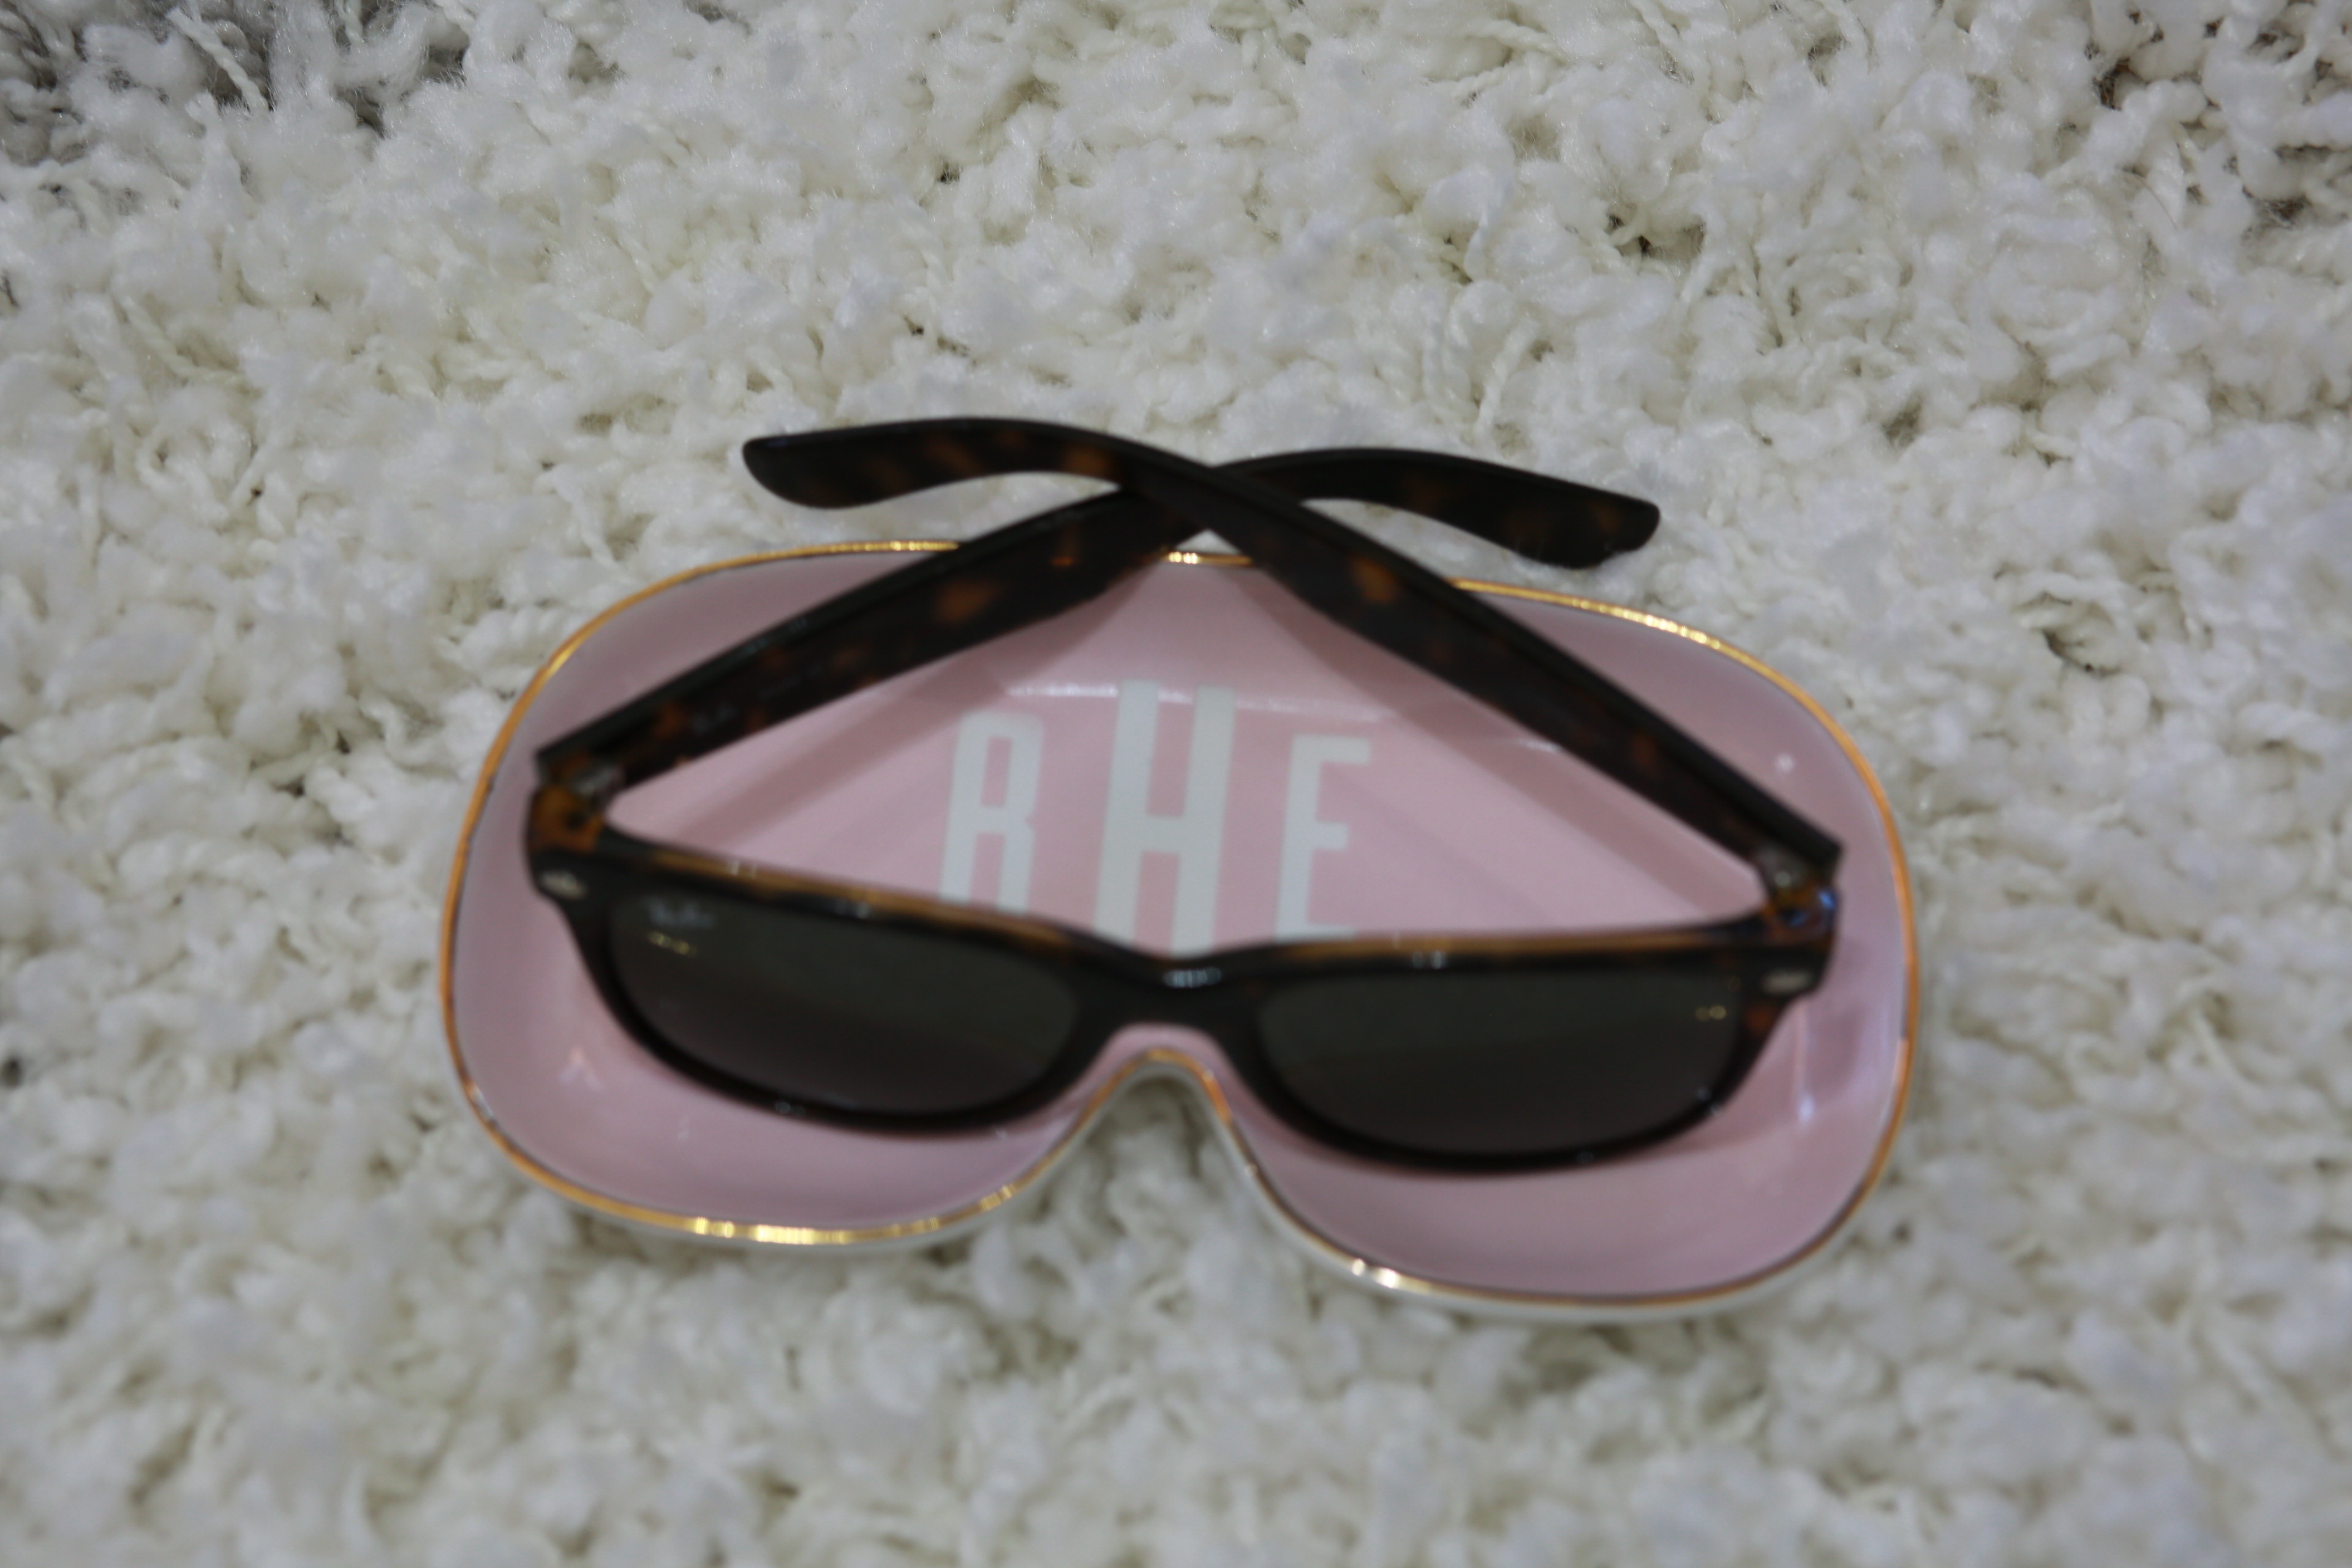 sunglasses storage, sunglasses, #rebekahelizstyle, #rebekahelizhome, sunnies, storage, how to store sunglasses, oyobox, monogrammed catchall, mark and graham, monogram